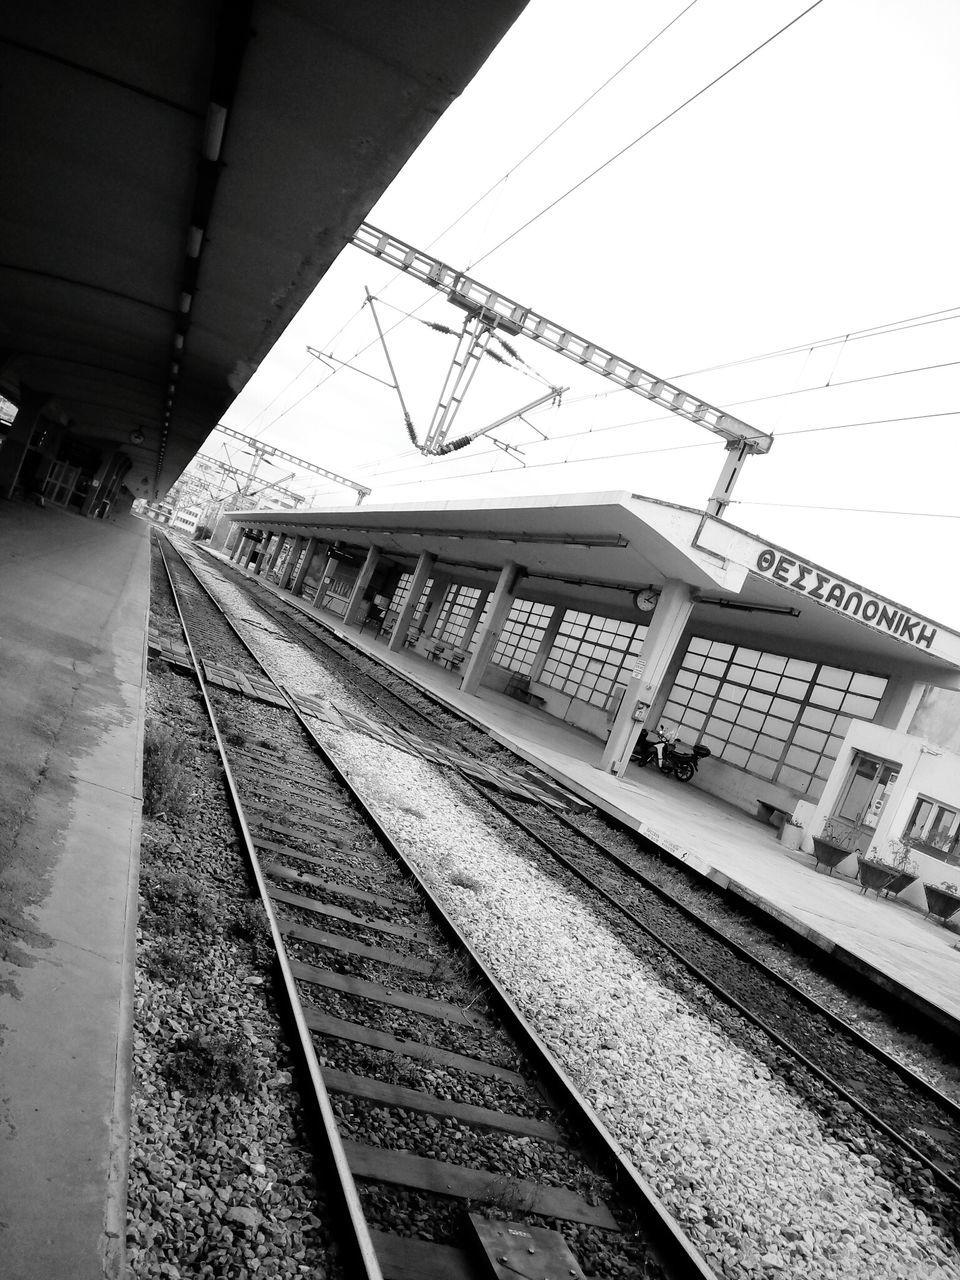 railroad track, rail transportation, transportation, public transportation, railroad station, railroad station platform, train - vehicle, no people, day, outdoors